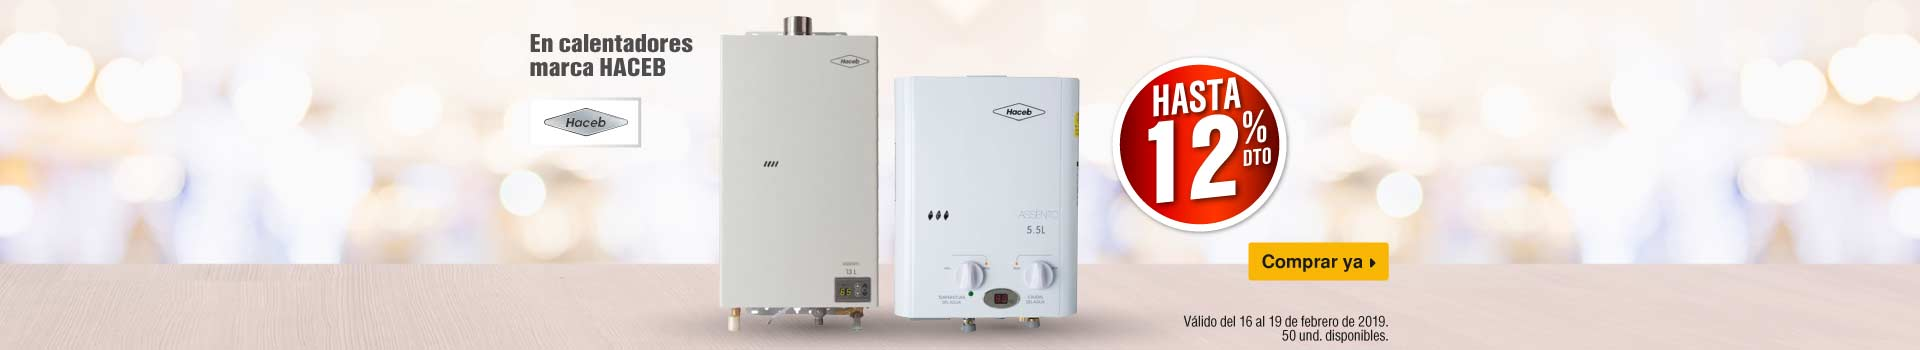 AK-KT-mayores-1-ELECT-BCAT-calentadores-150219